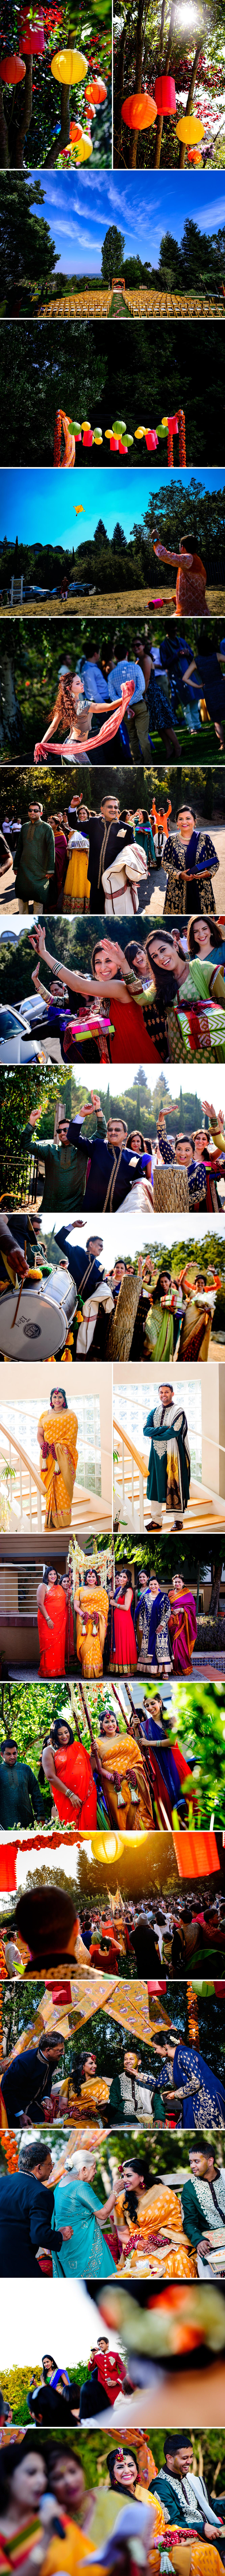 Haldi Ceremony Pictures Indian Wedding